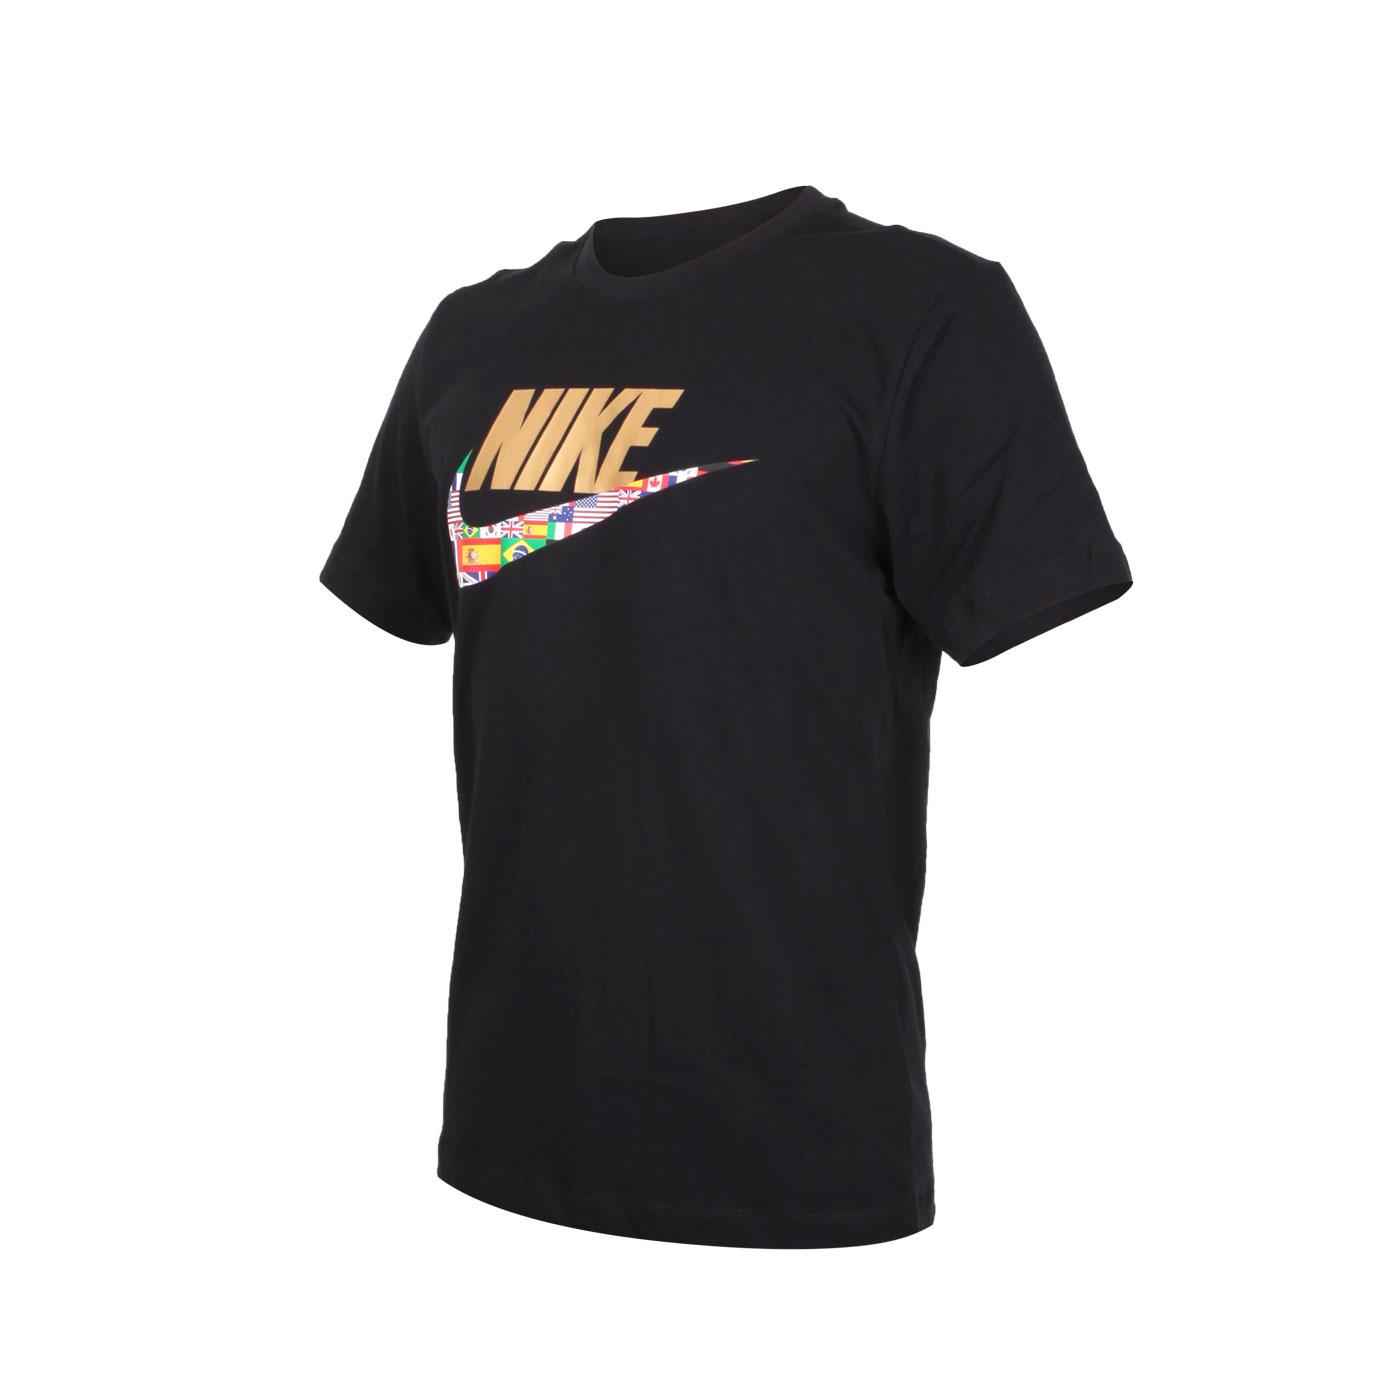 NIKE 男款短袖T恤 CT6551-010 - 黑黃藍紅綠